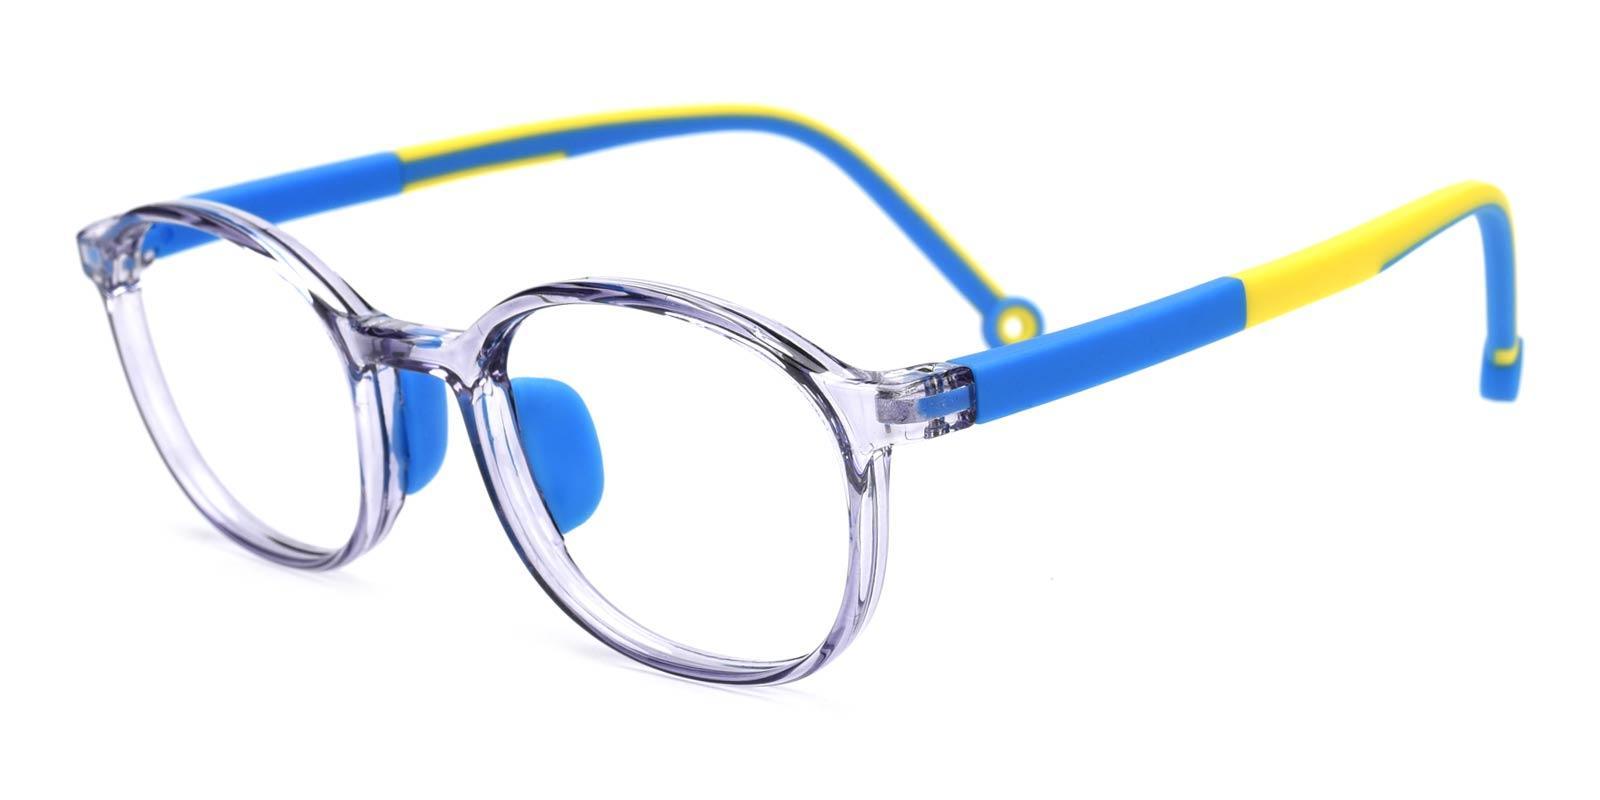 Glen-Translucent-Oval-Plastic-Eyeglasses-detail